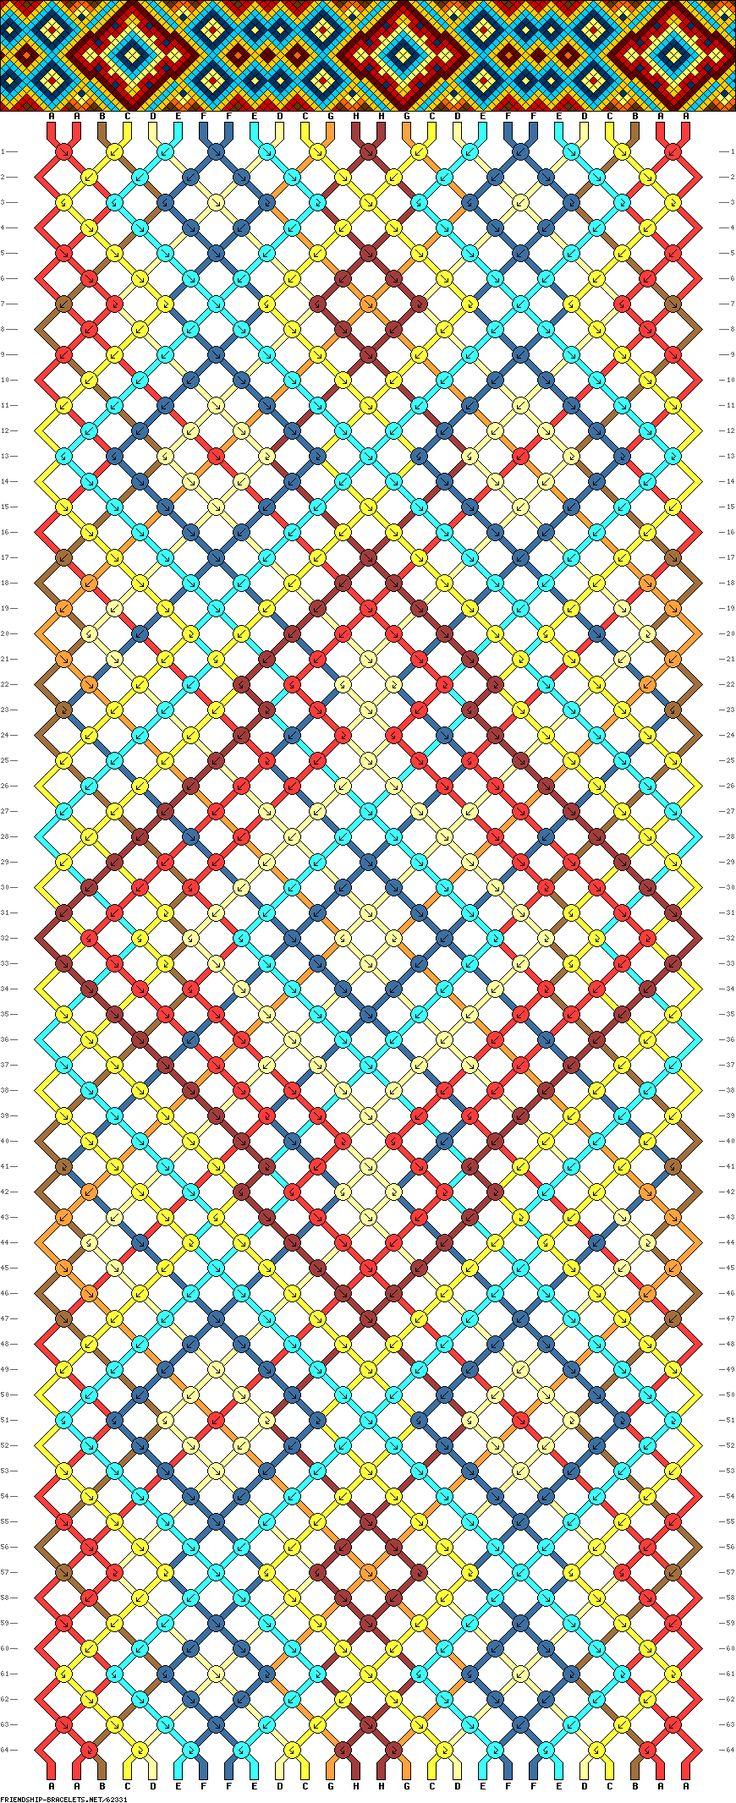 Friendship Bracelet Pattern  Diamonds, Squares, Stars  26 Strings, 8  Colors